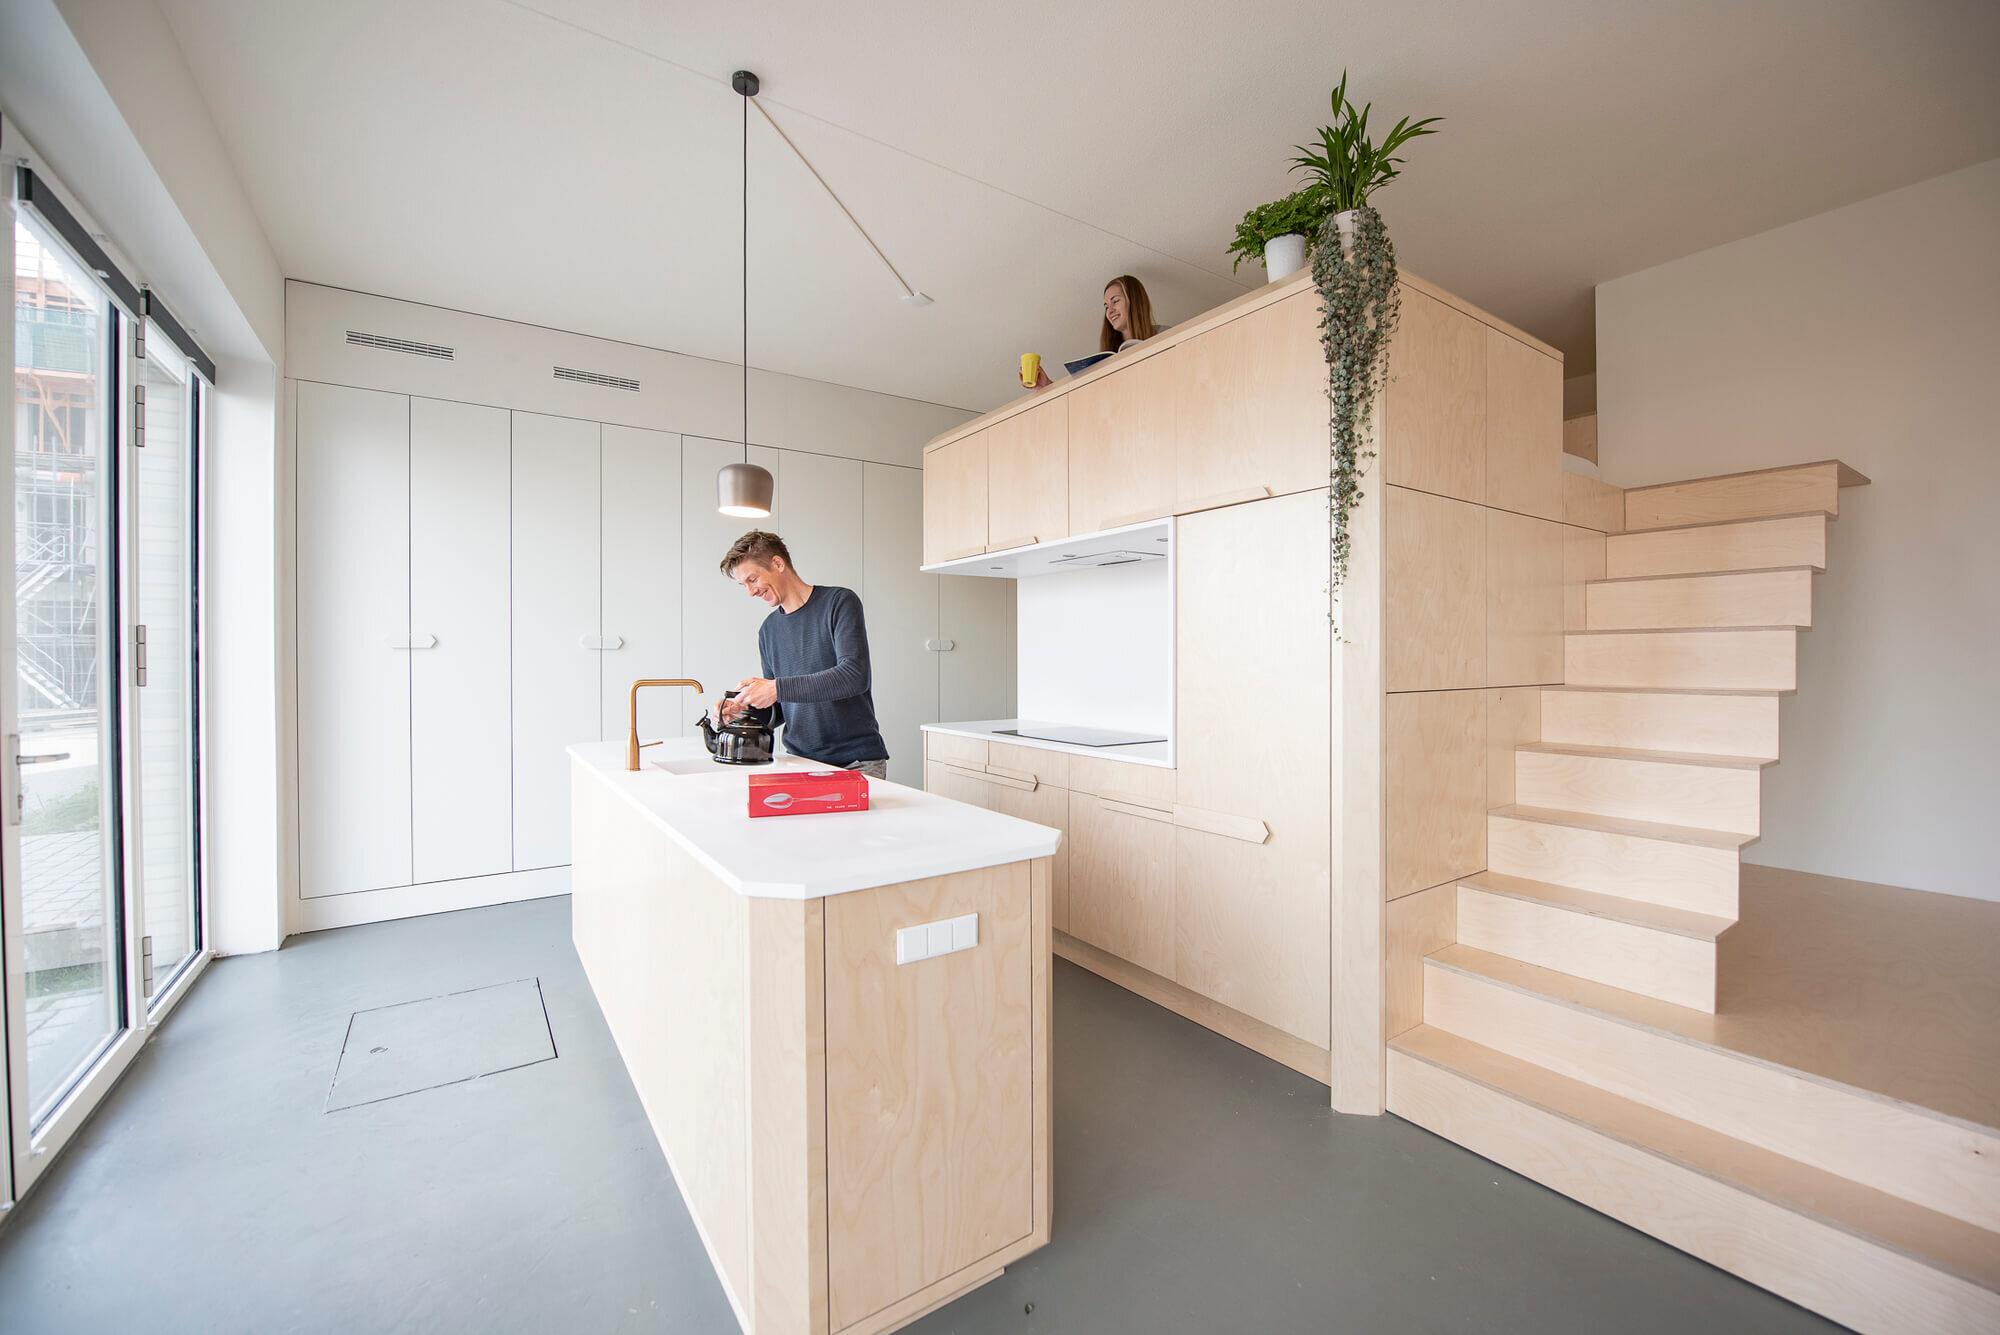 Loft-Buiksloterham-Heren-5-Architects-The-Netherlands-0